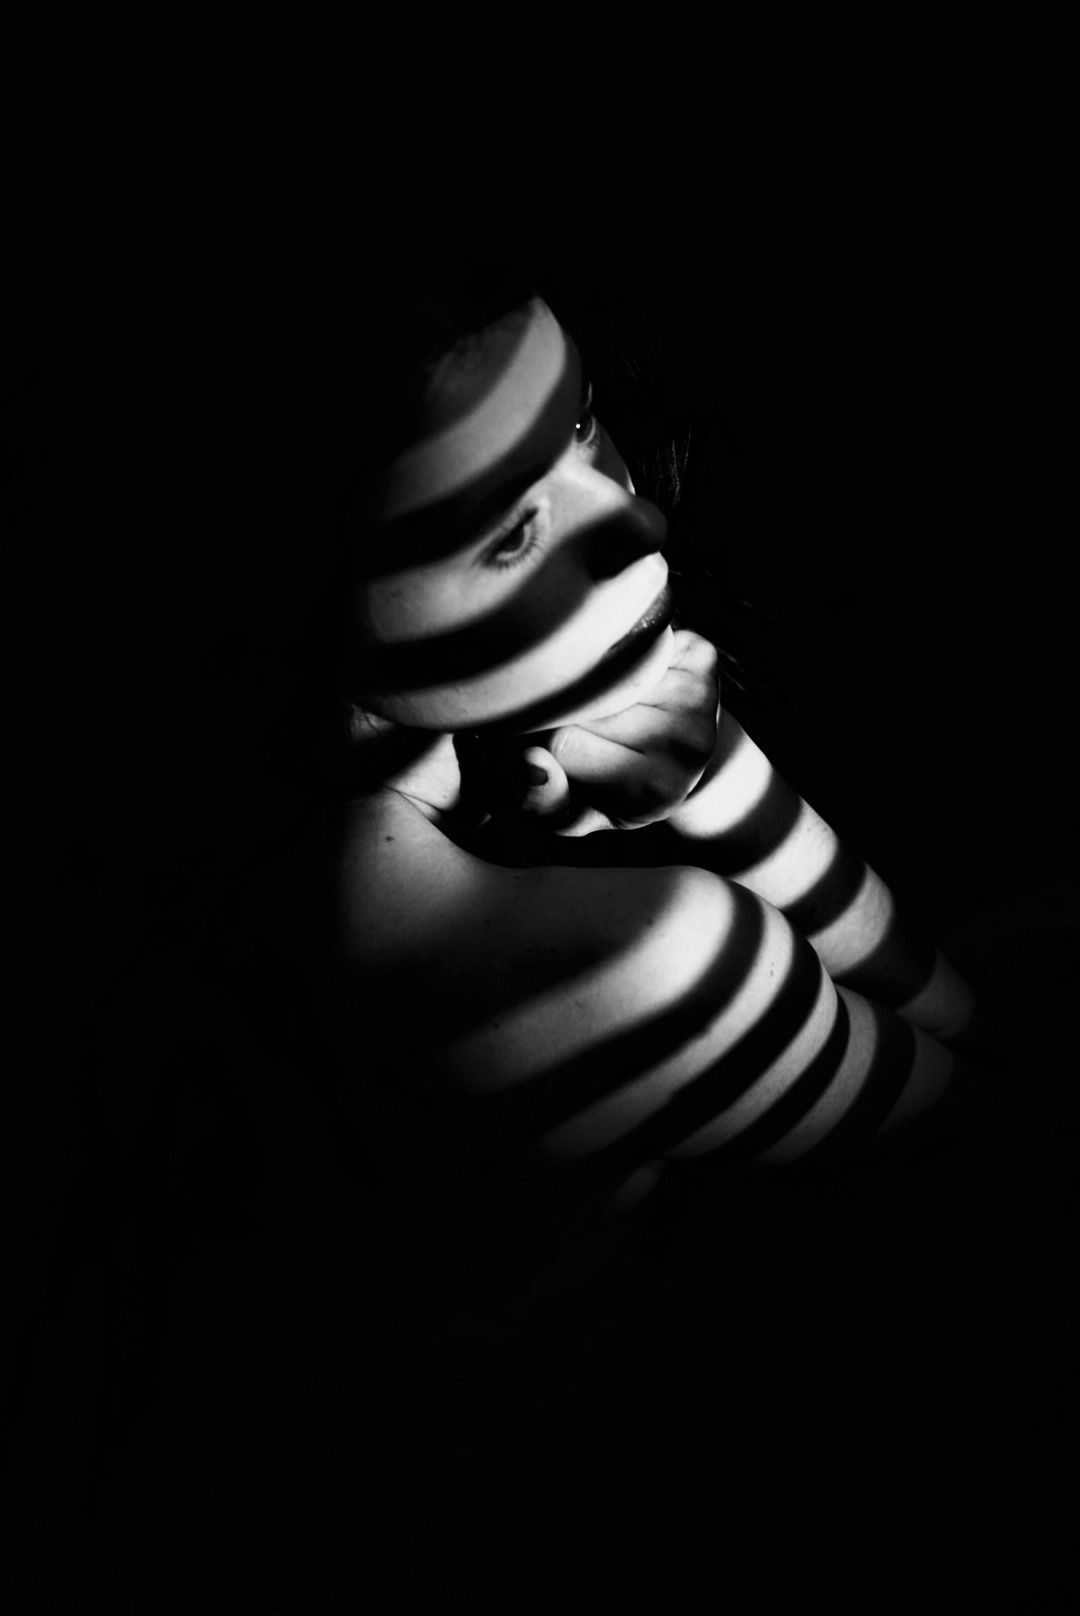 Light vs shadow -